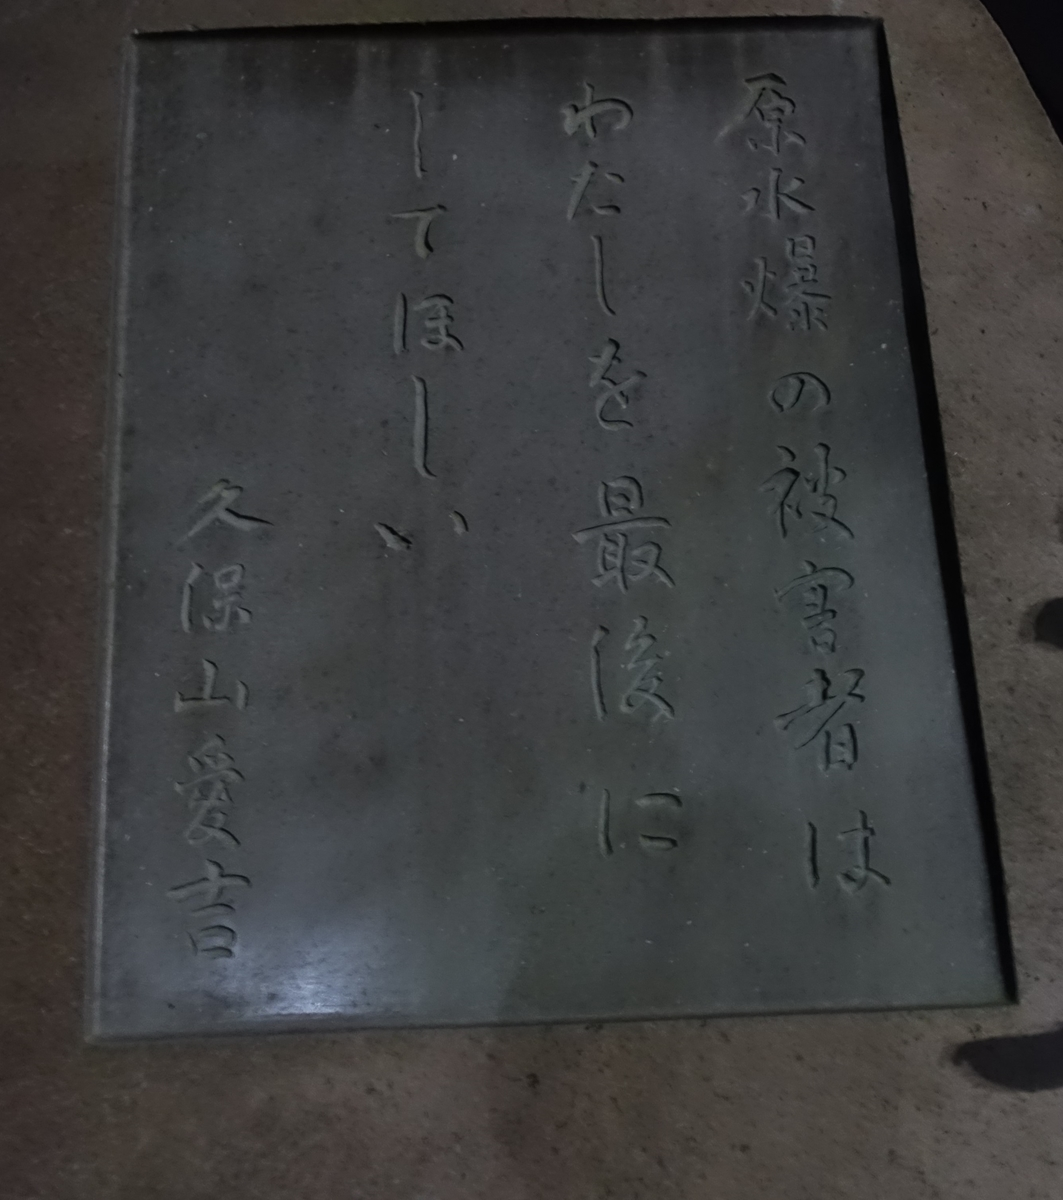 f:id:haniwakai:20210703133341j:plain